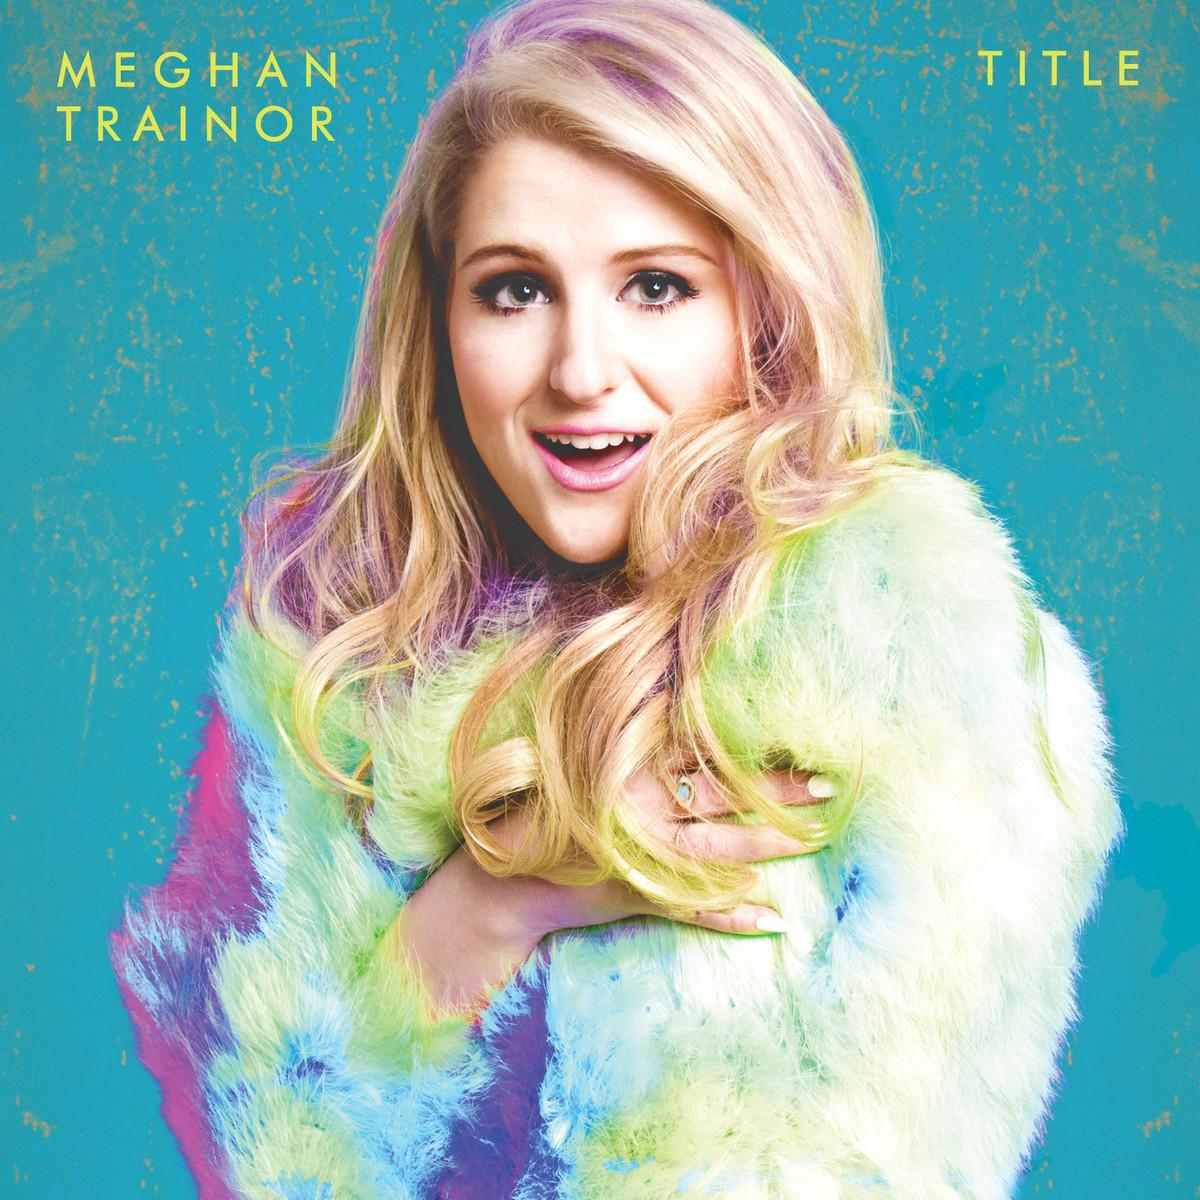 Meghan-Trainor-Title-2014-Deluxe-1200x1200